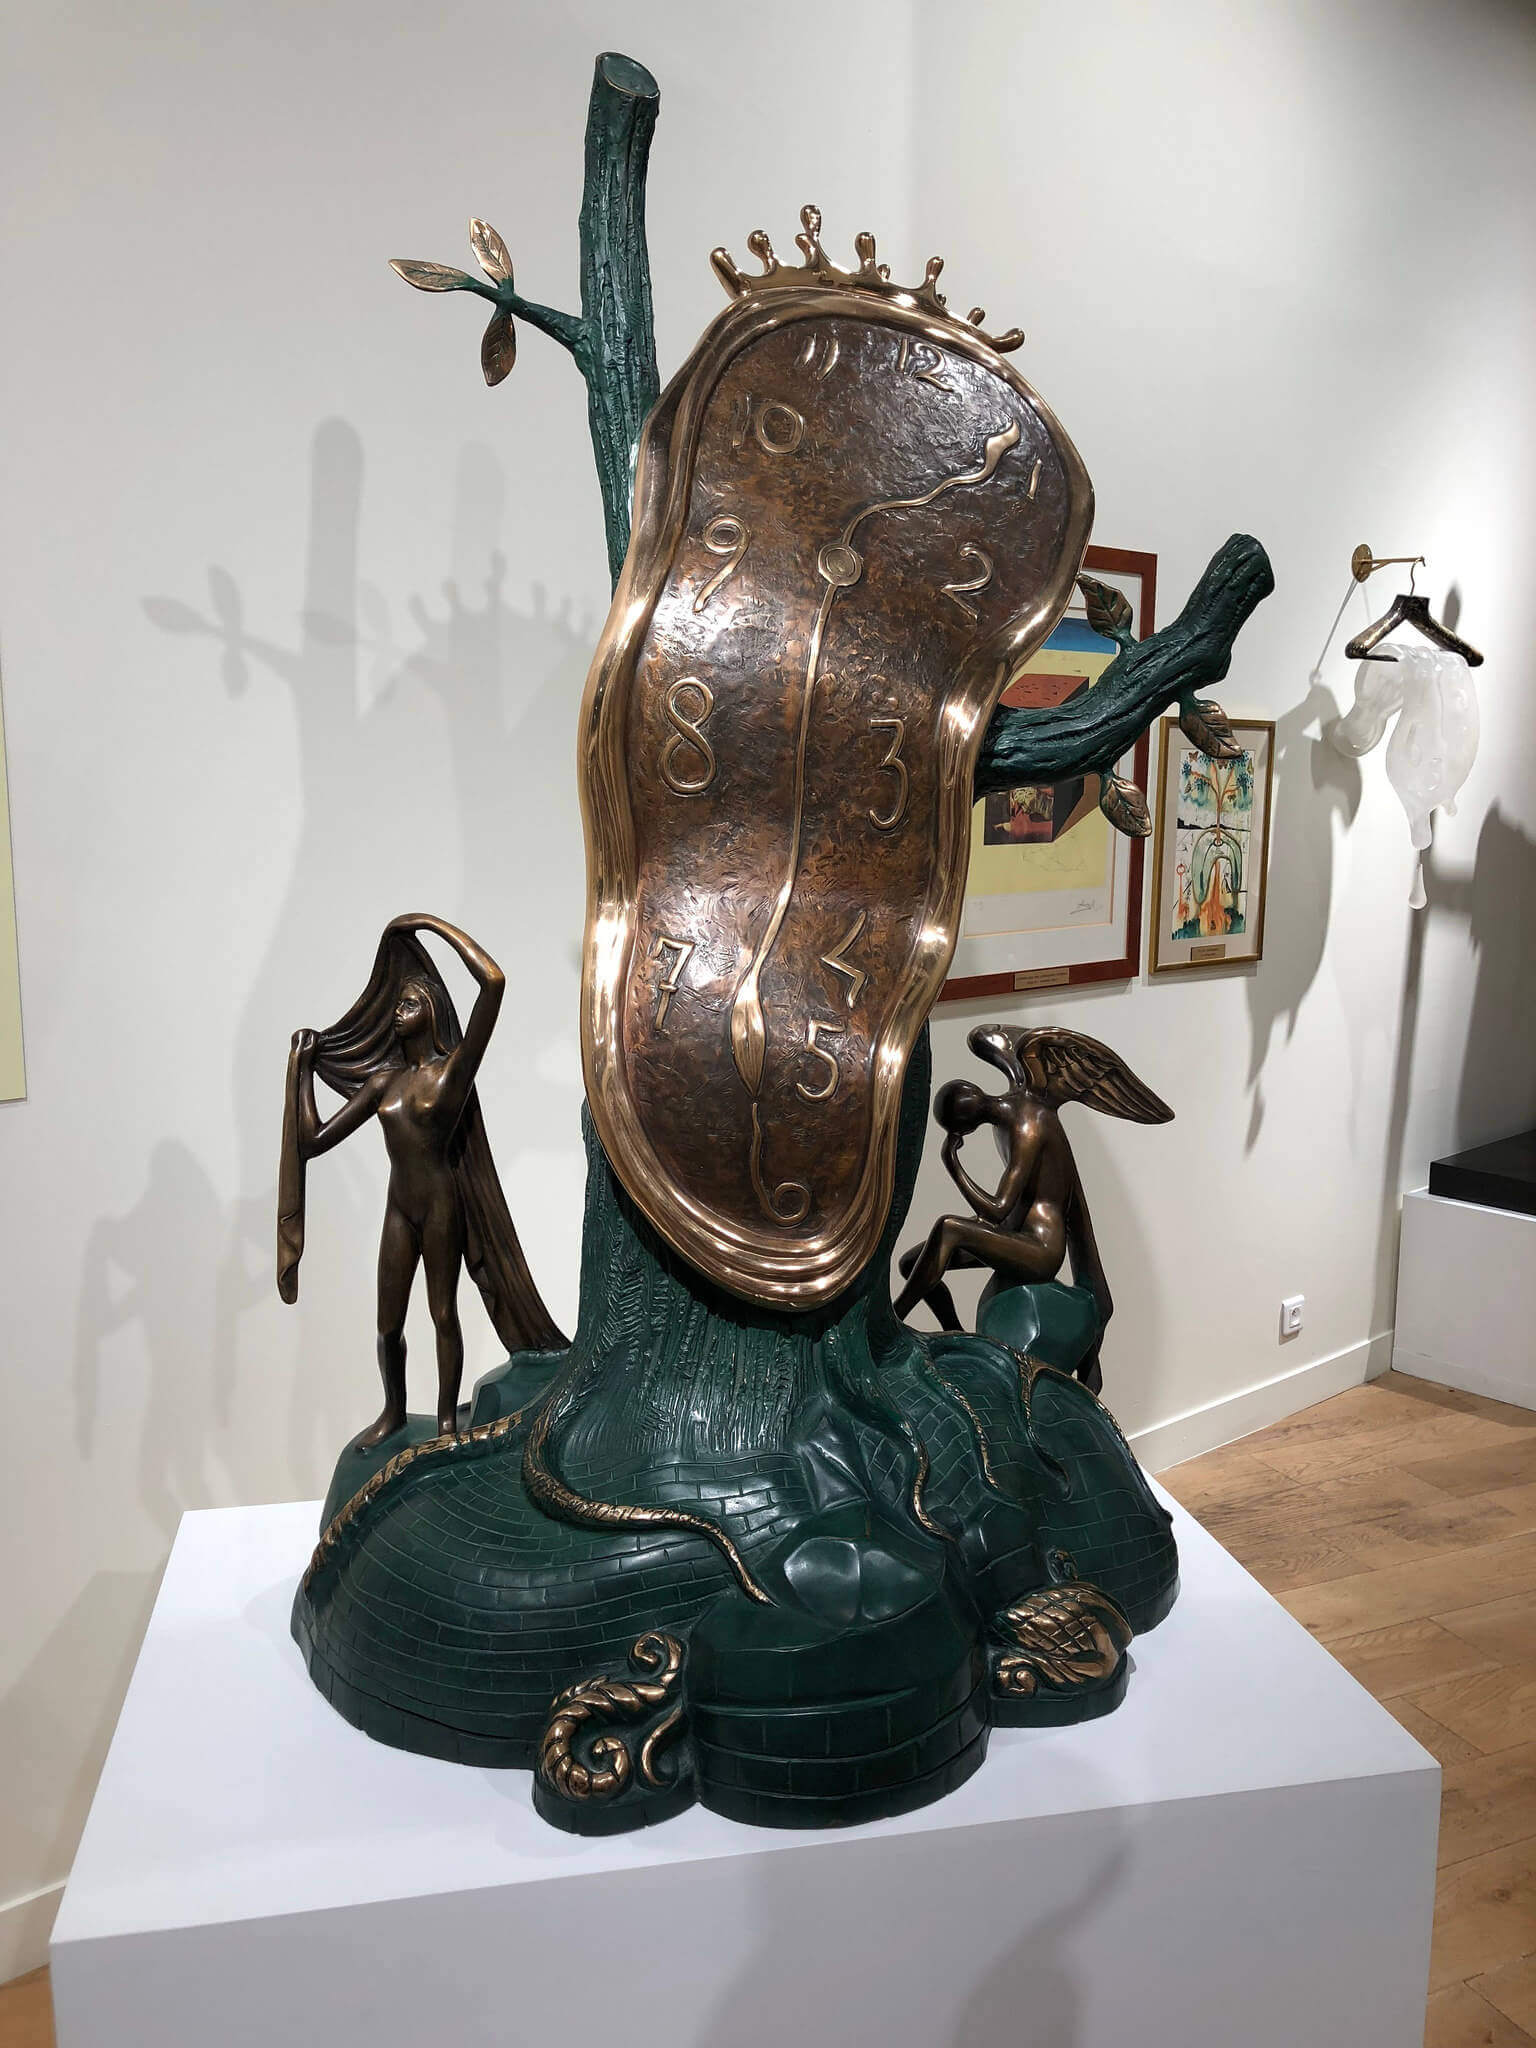 Salvador Dali - Melting Clocks - Paris France